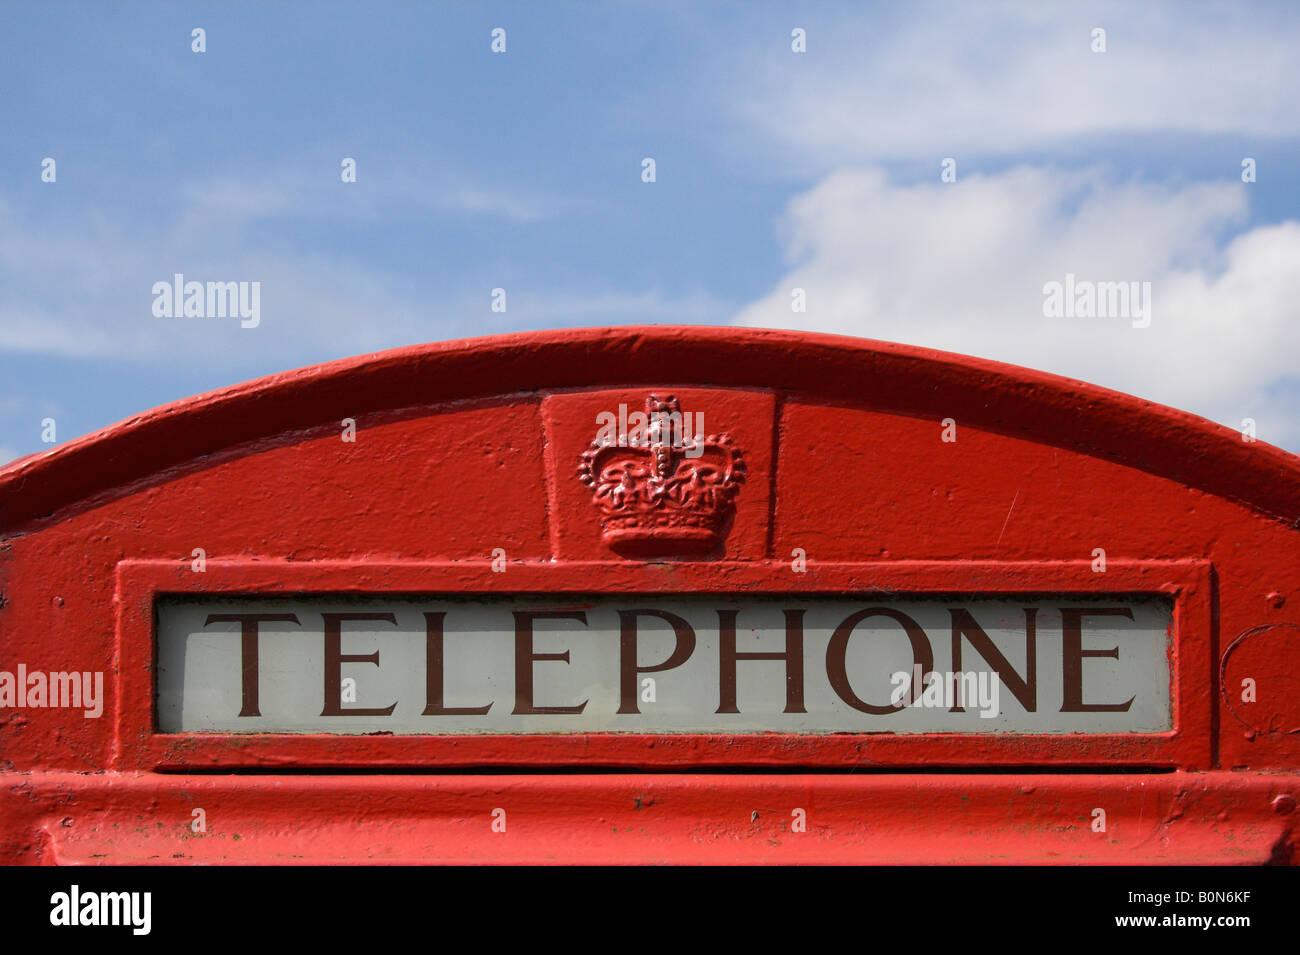 Traditional British red telephone box - Stock Image